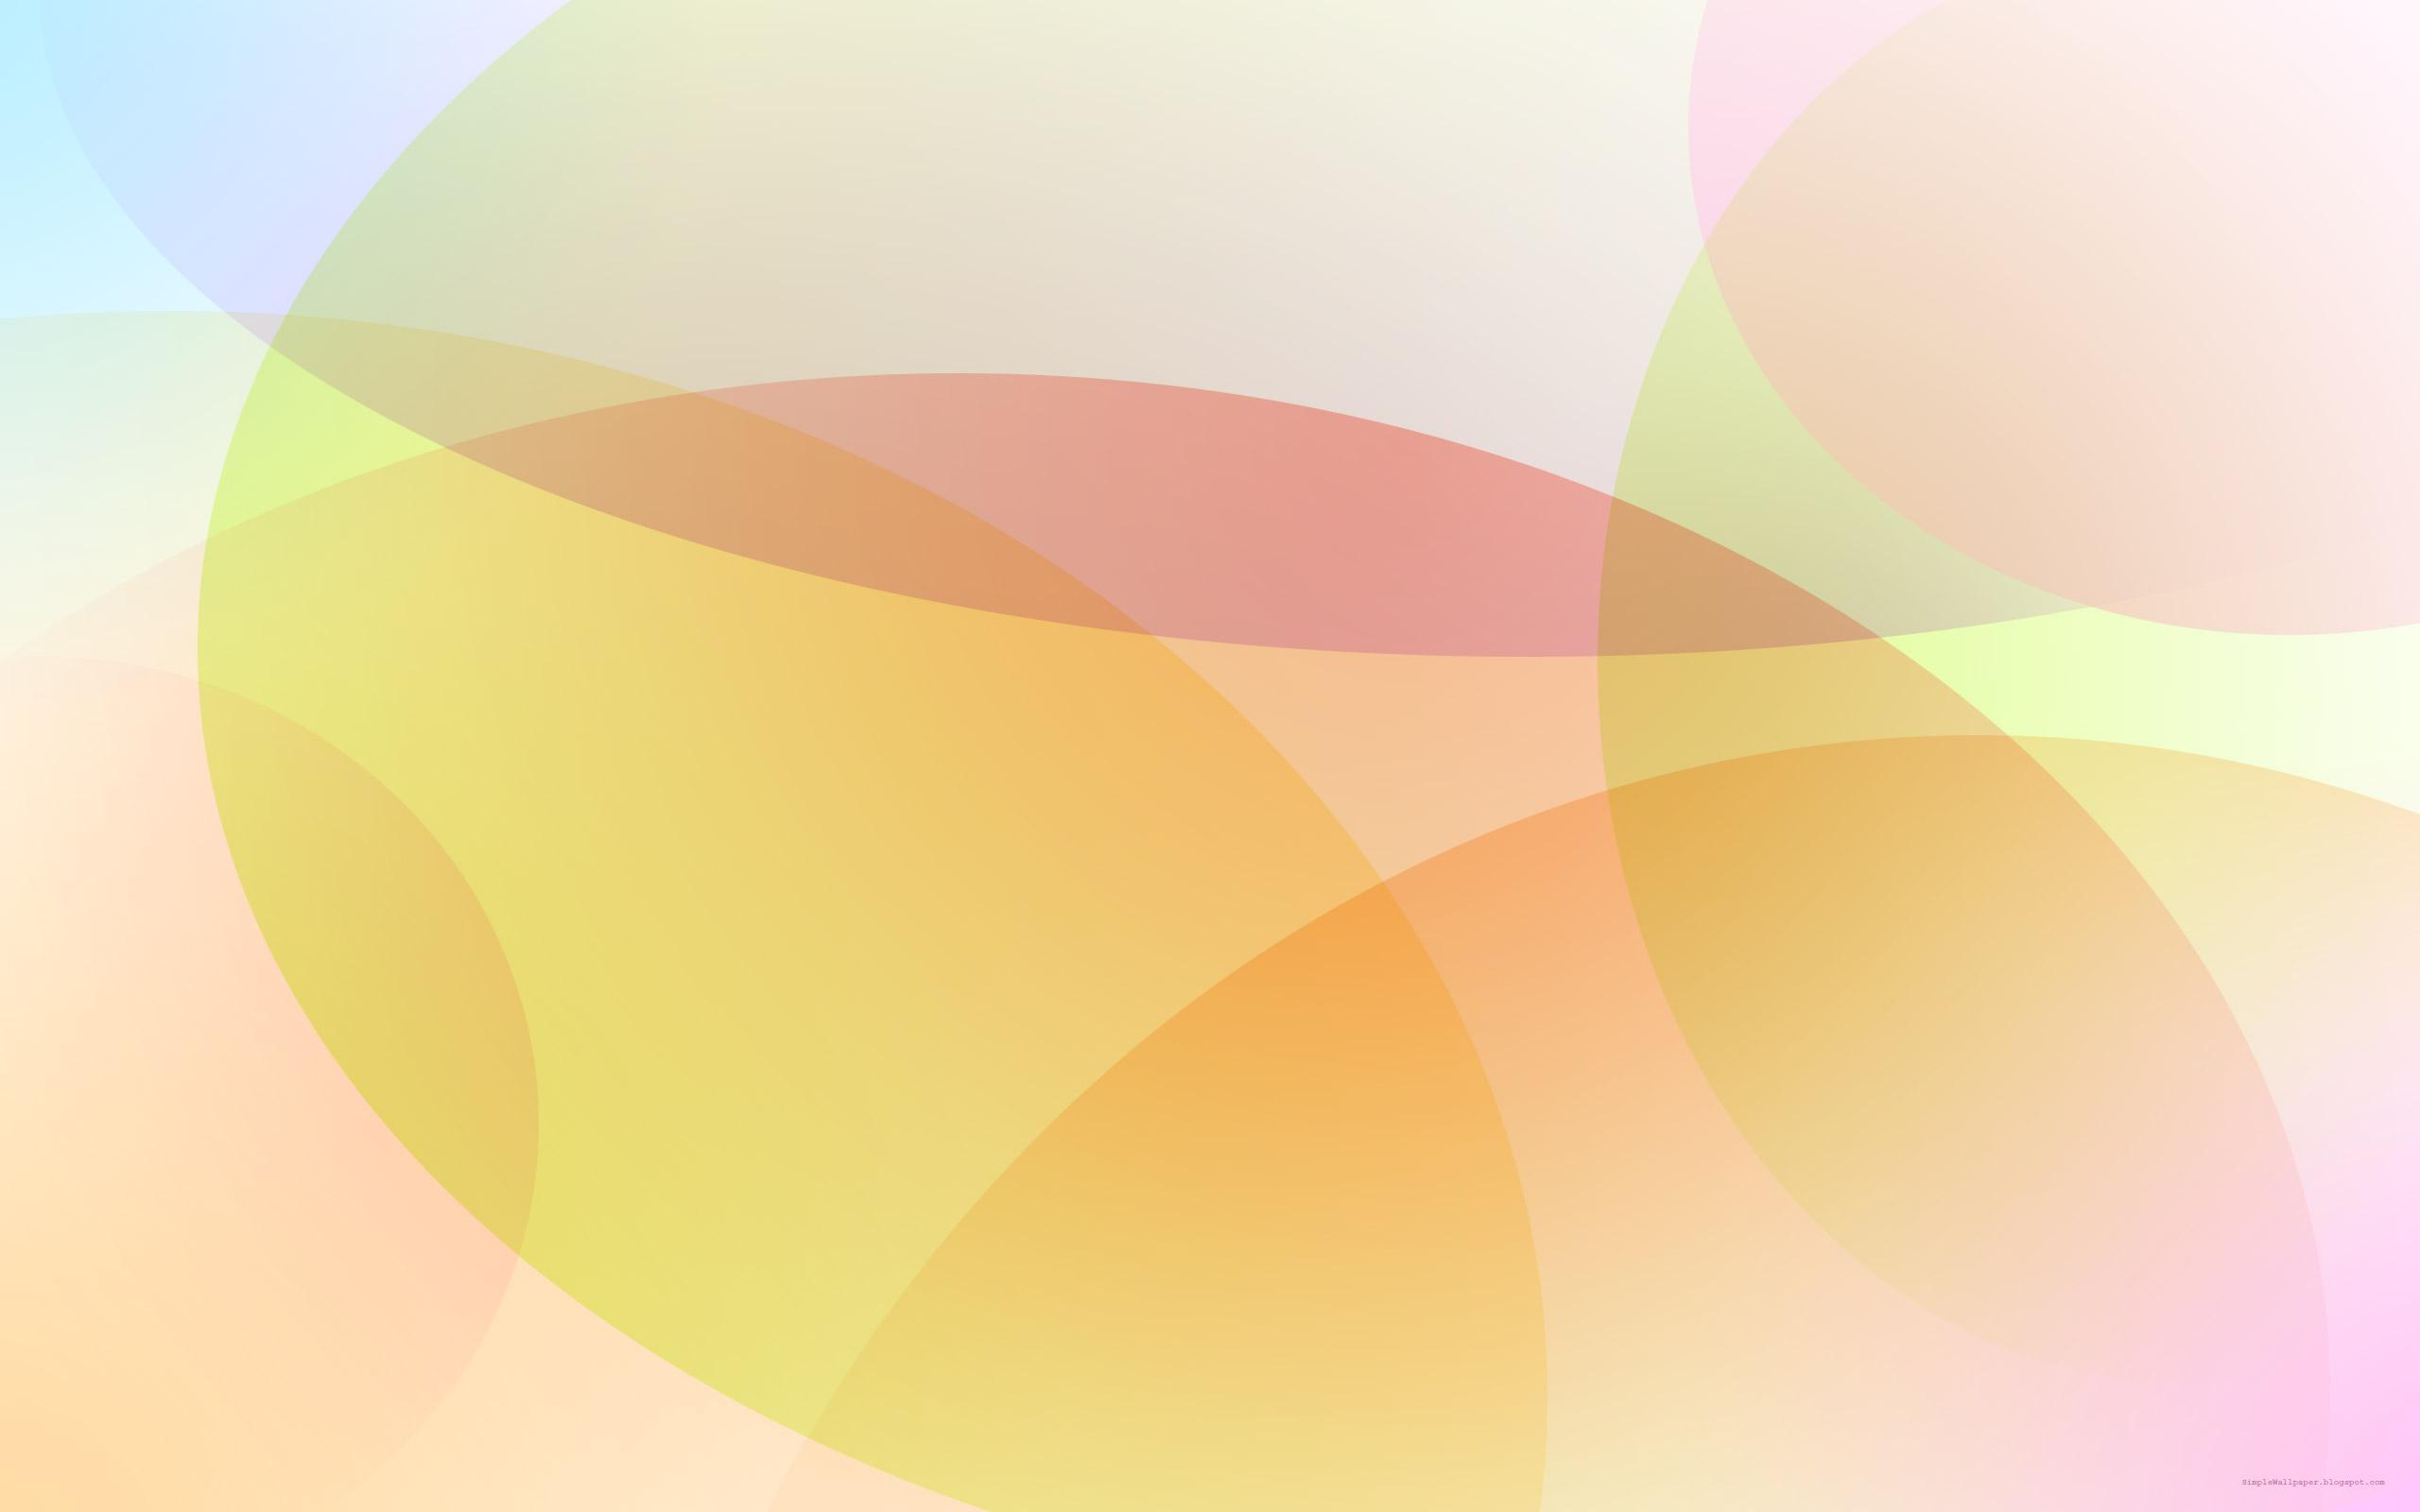 wallpaper Pastel Rainbow Wallpaper hd wallpaper background desktop 2560x1600